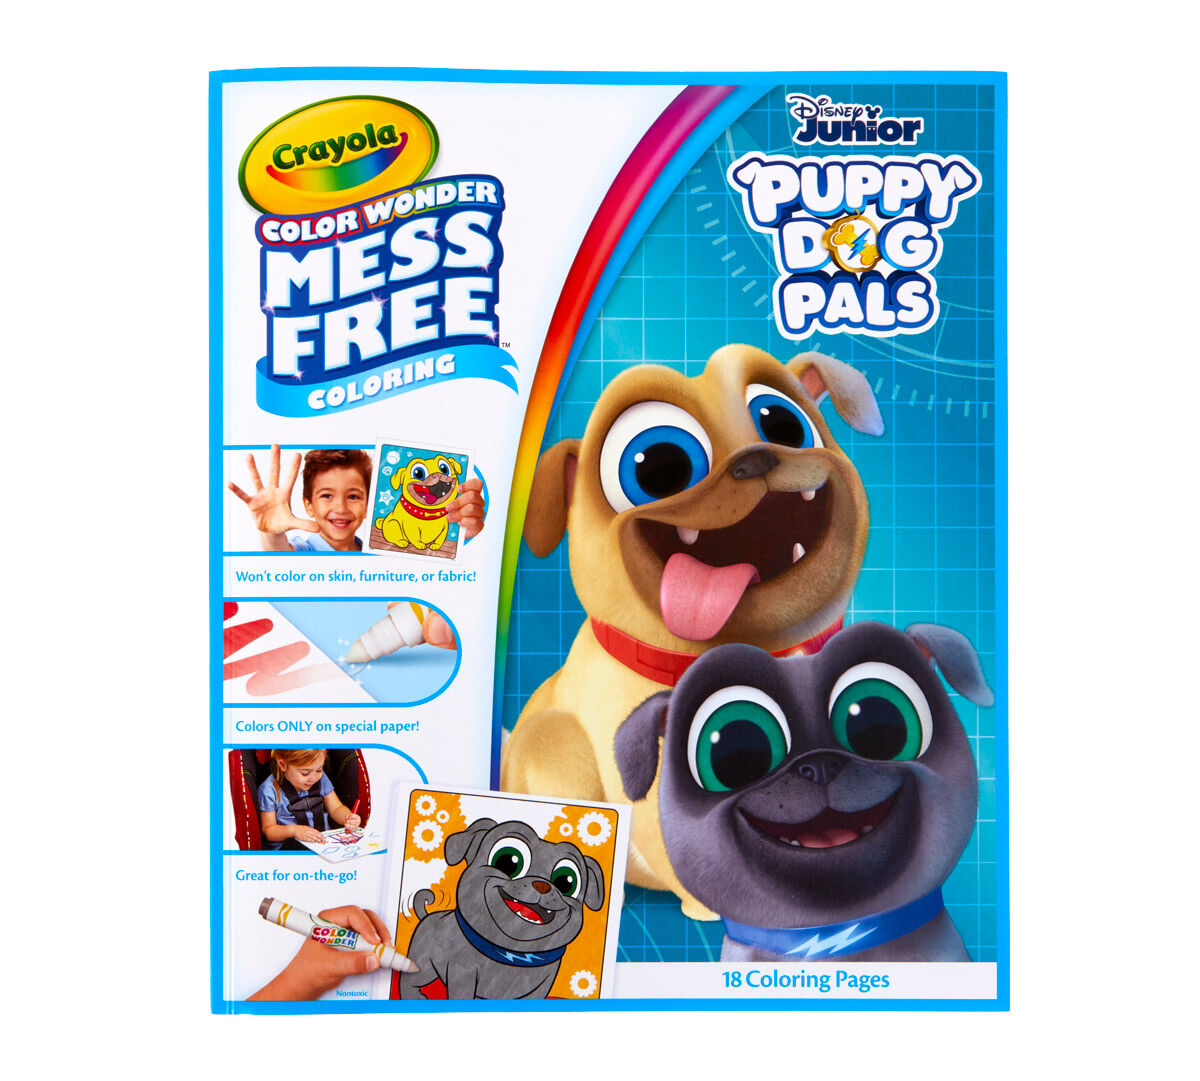 - Color Wonder Mess Free Puppy Dog Pals Book Crayola.com Crayola